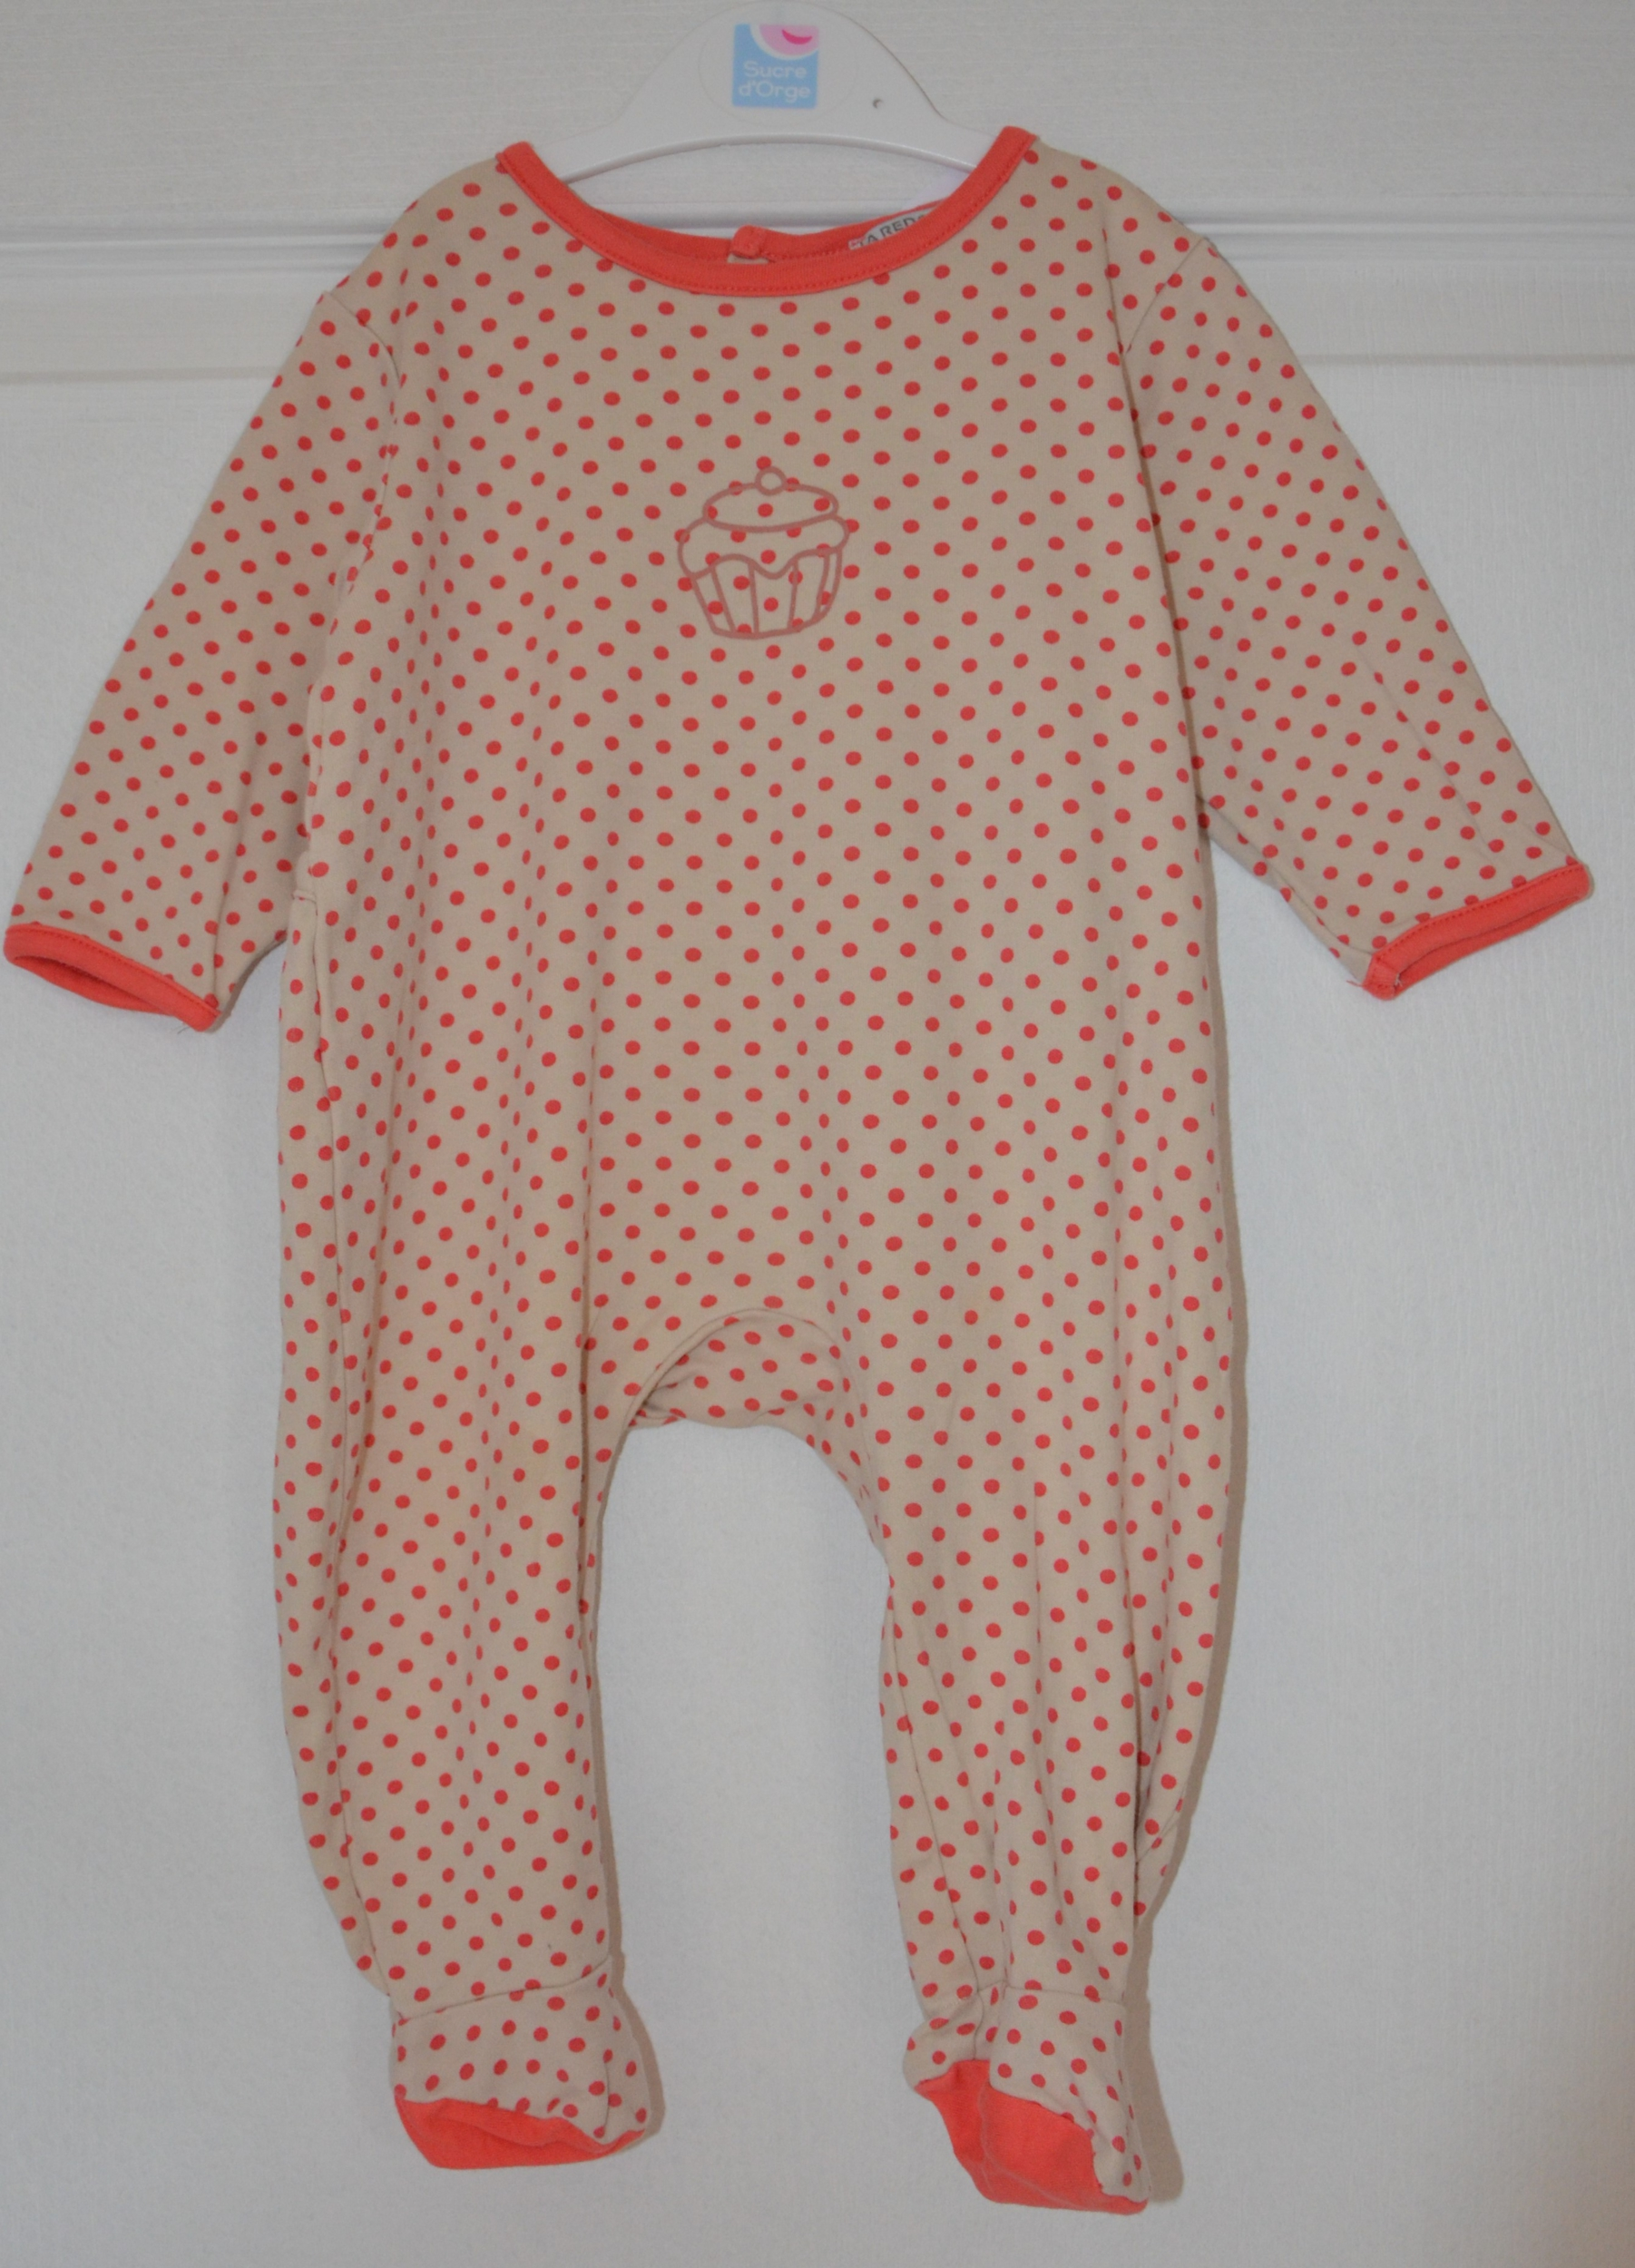 pyjama fille 6 mois la redoute a pois